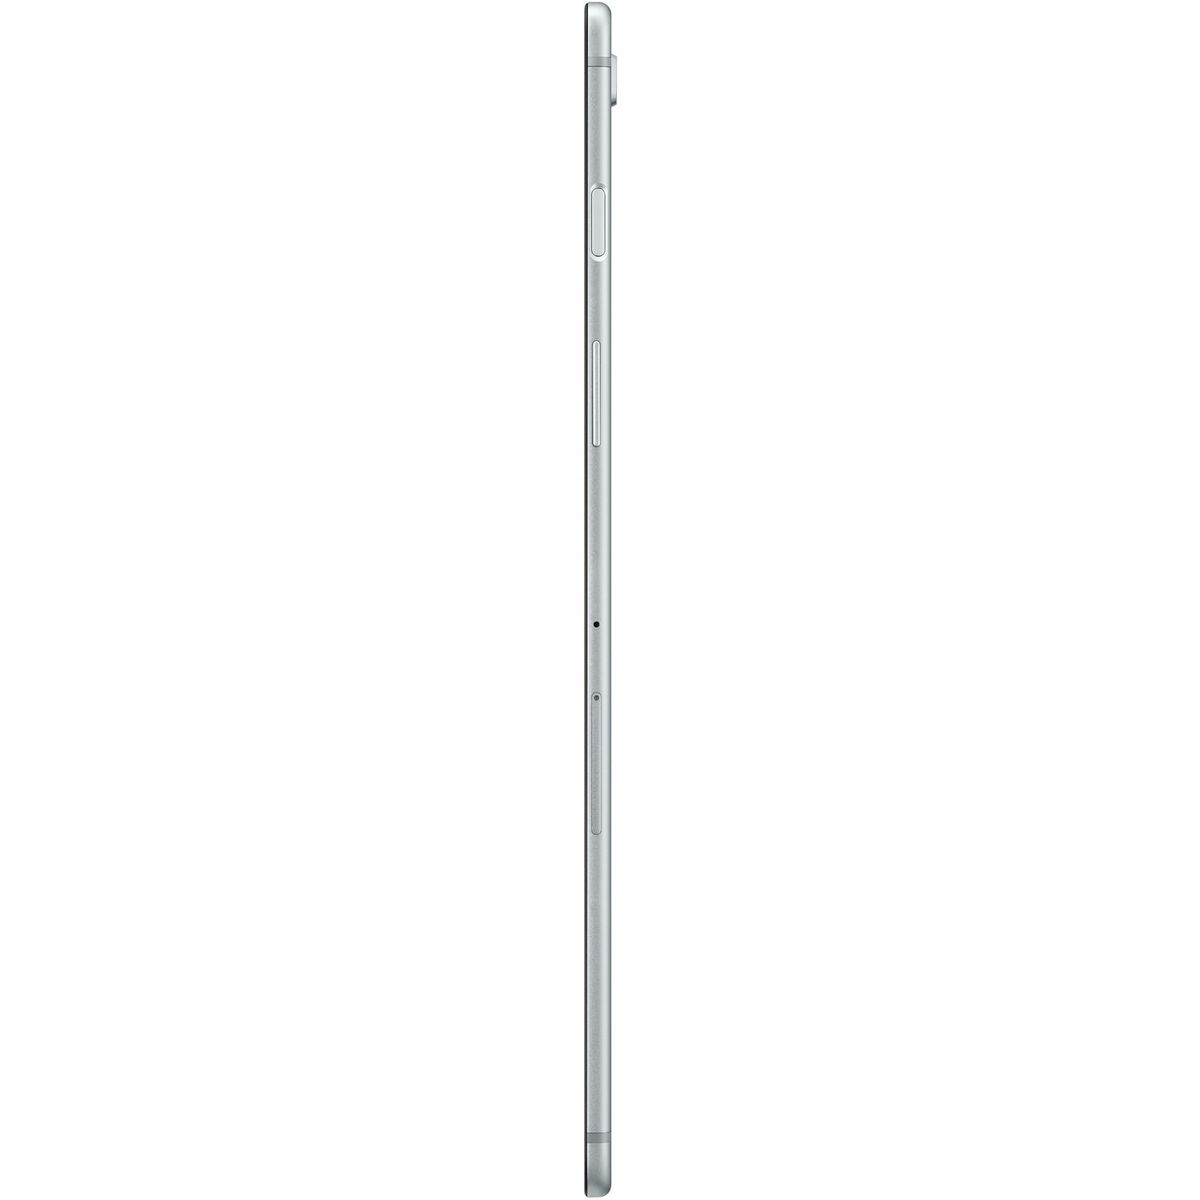 SAMSUNG Tablette tactile Galaxy Tab S5e - 64Go - 10.5 pouces - Silver - Wifi